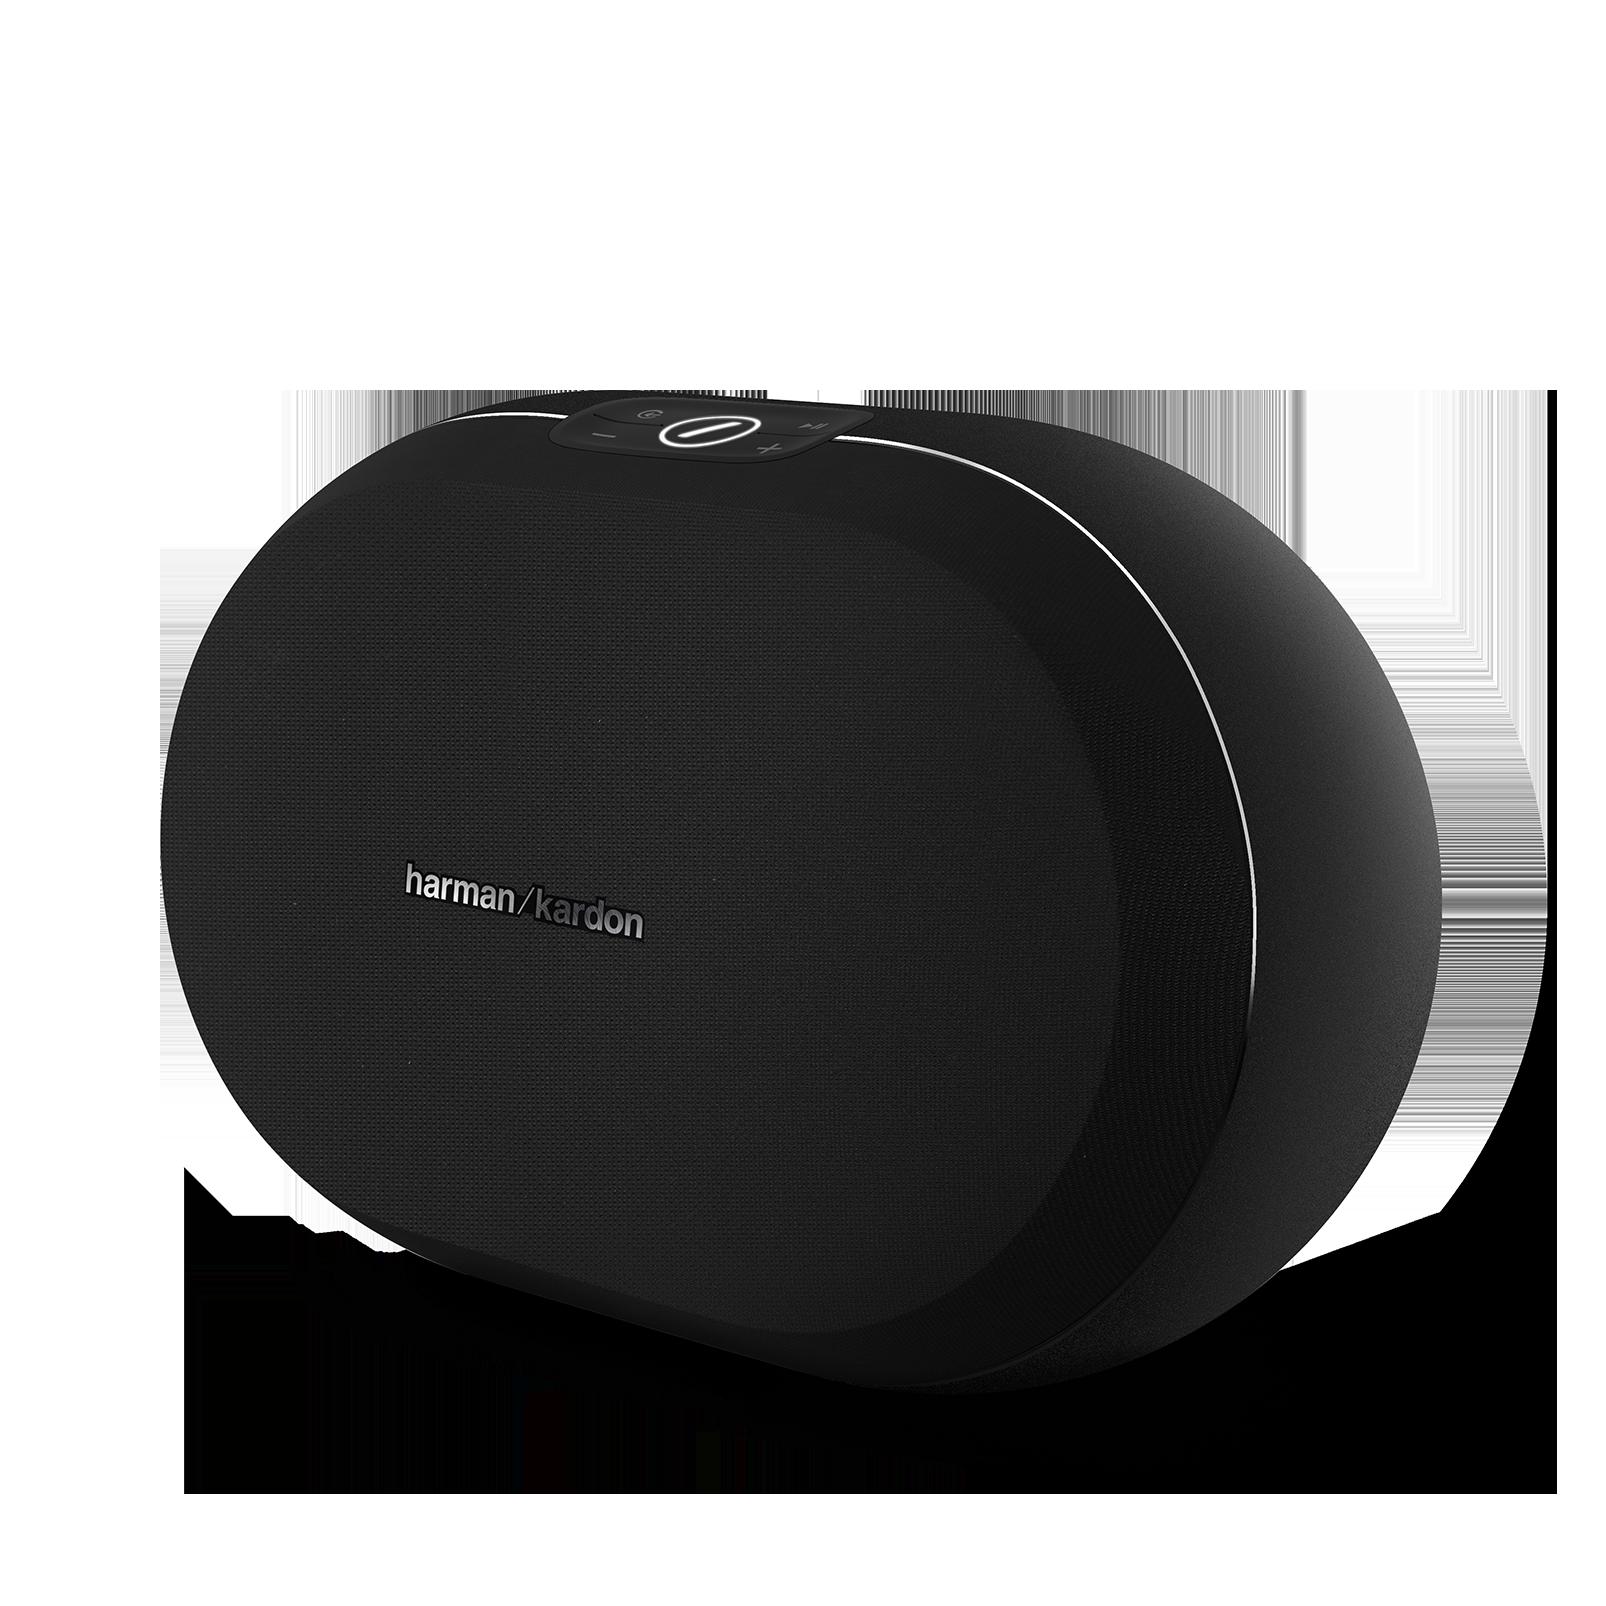 Omni 20 Plus - Black - Wireless HD stereo speaker - Detailshot 1